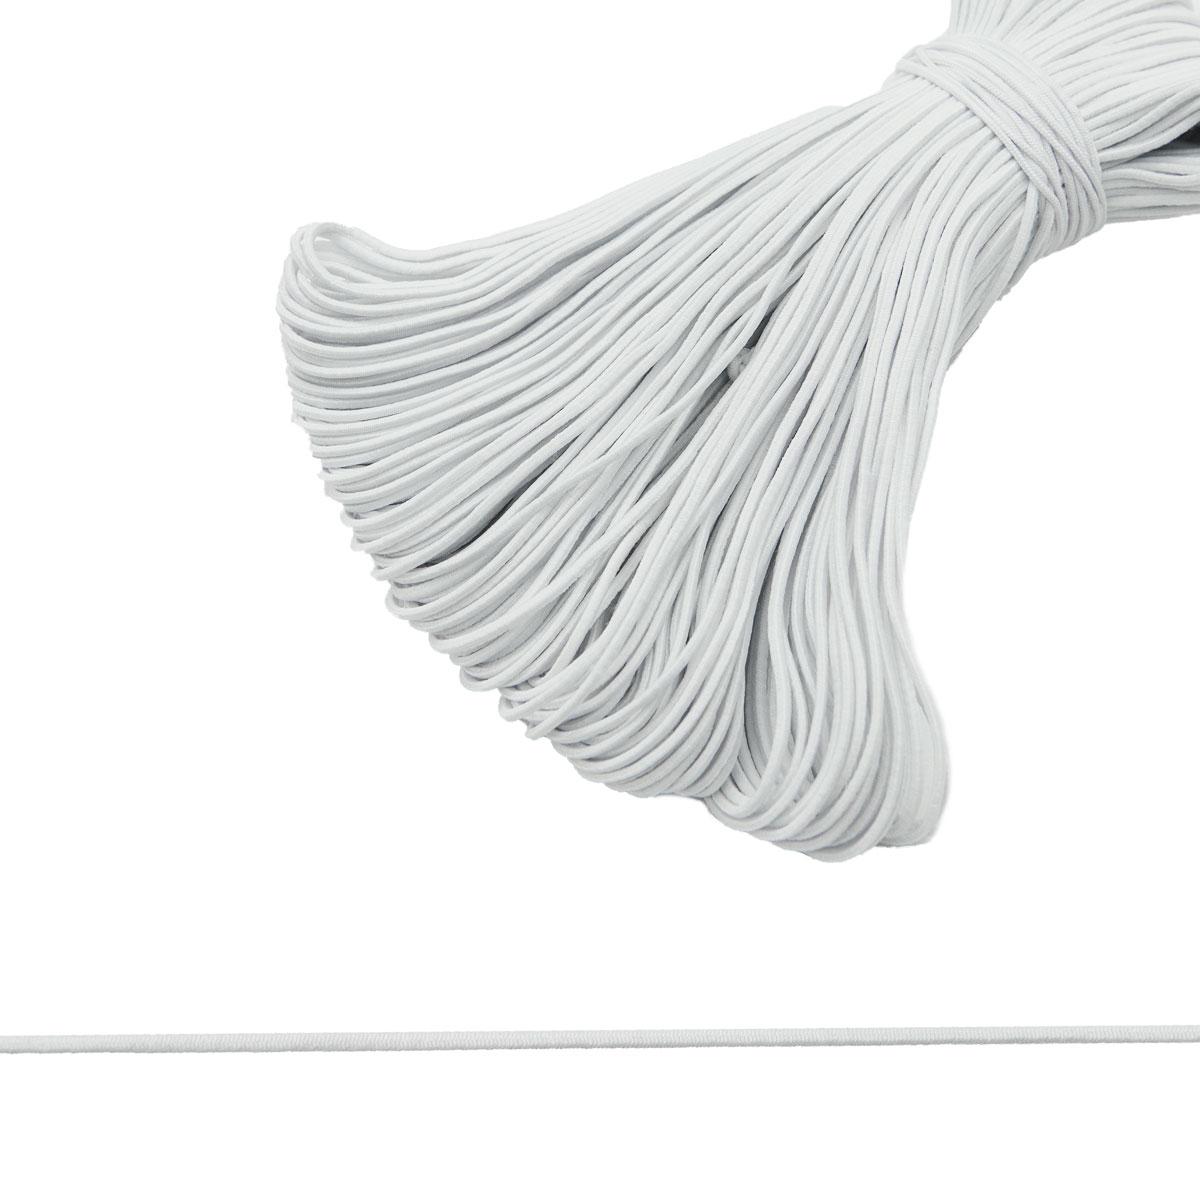 С3576Г17 Шнур отделочный эластичный 1,5мм*50м